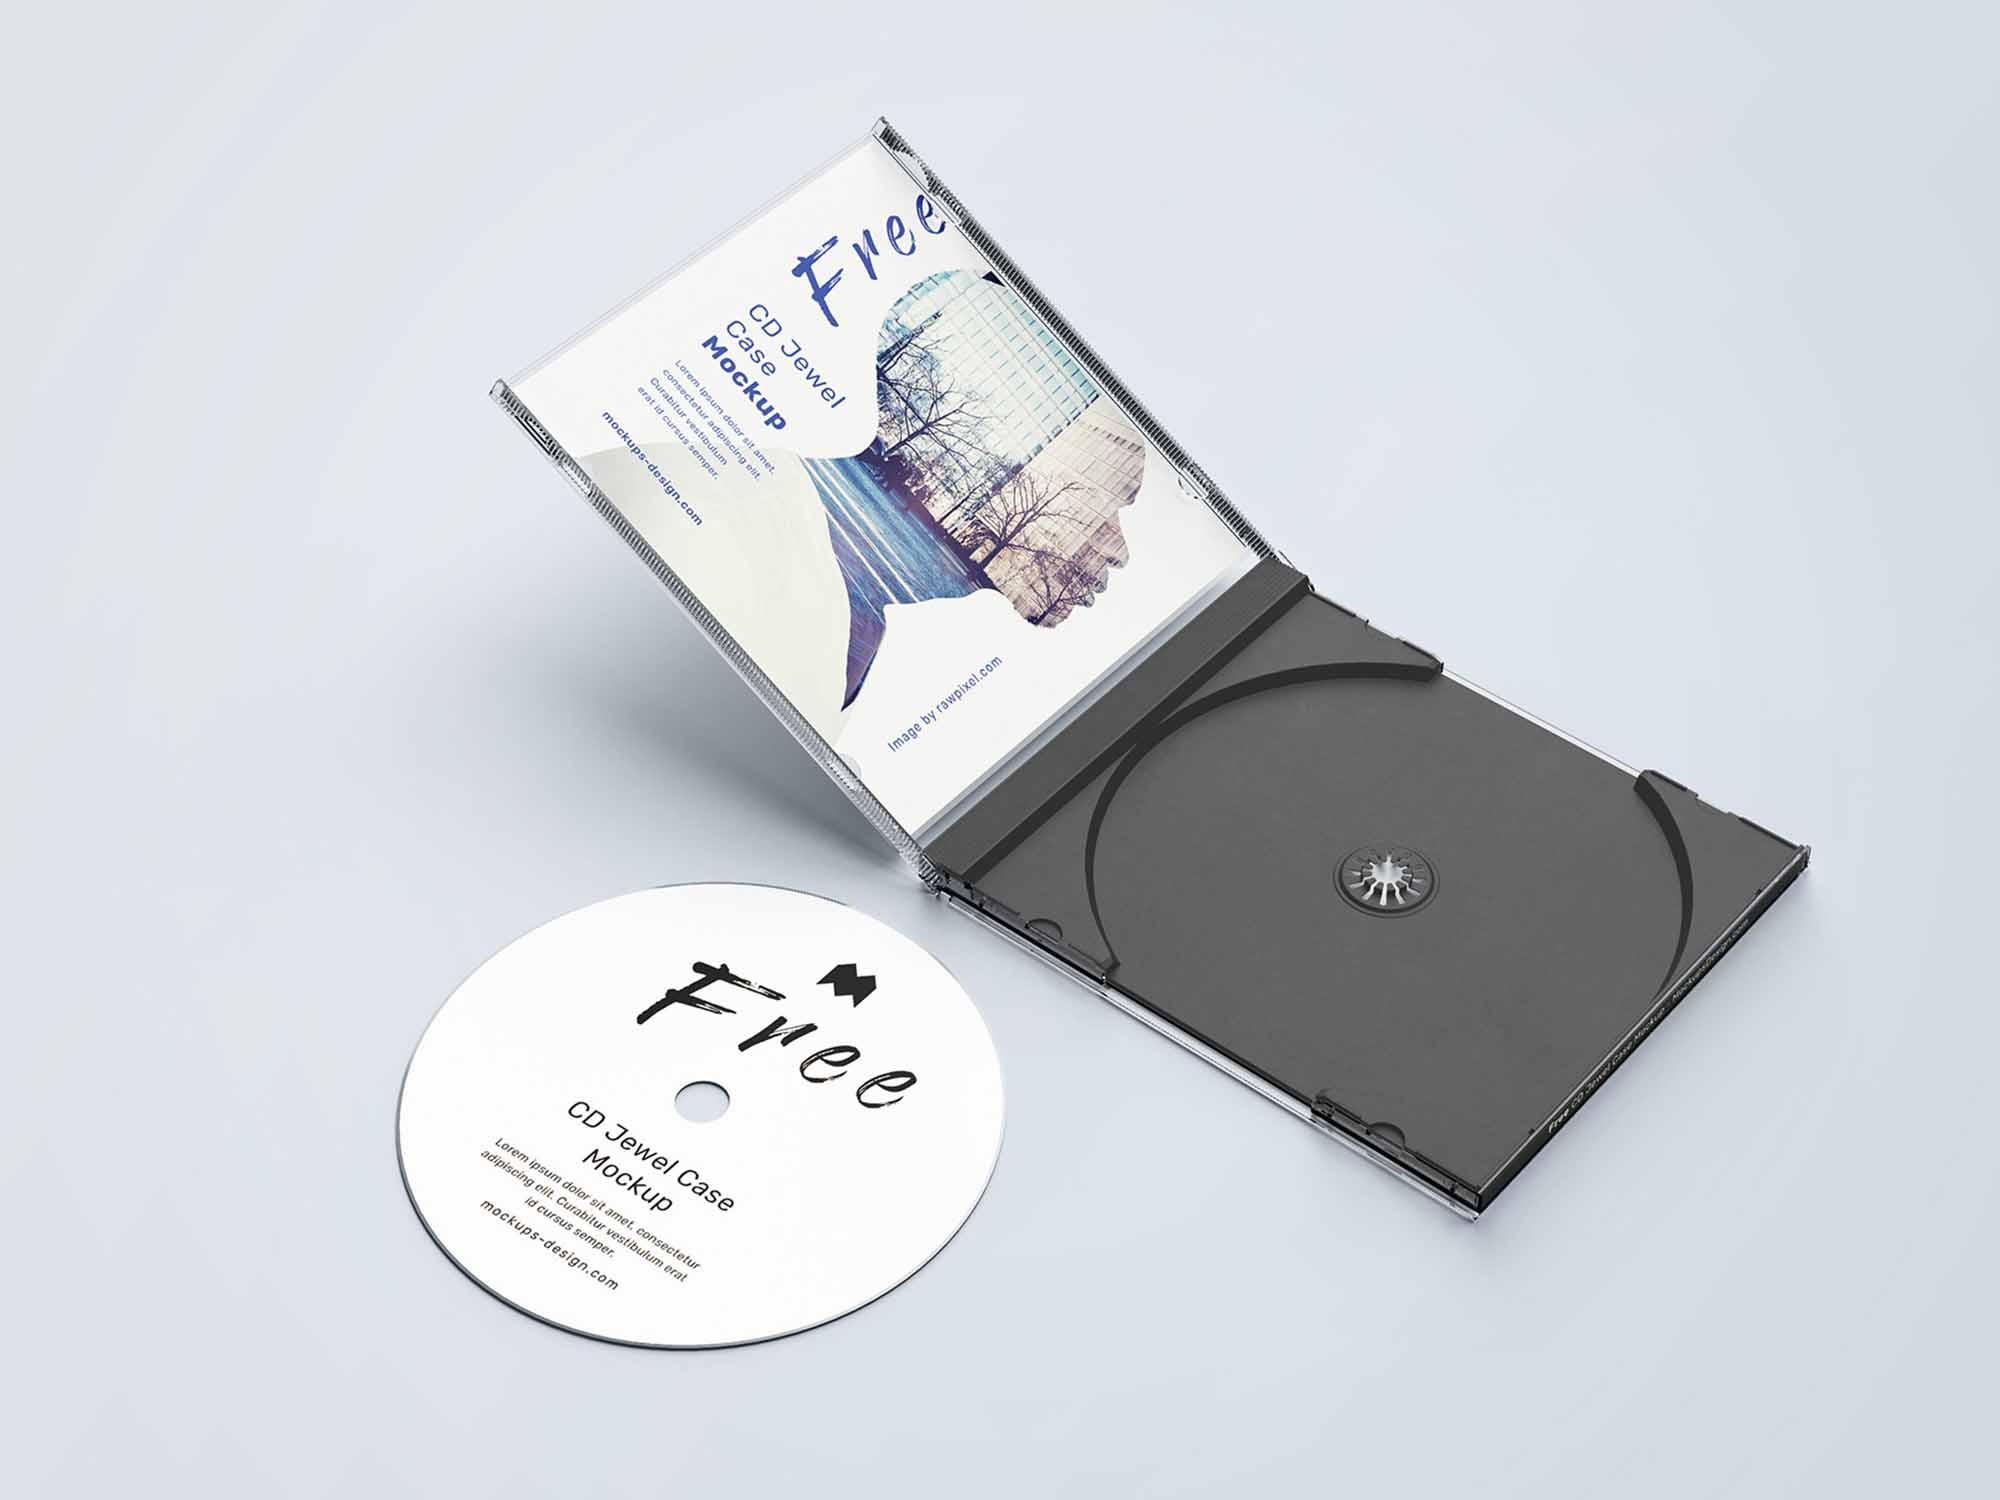 CD jewel Case Mockup 3